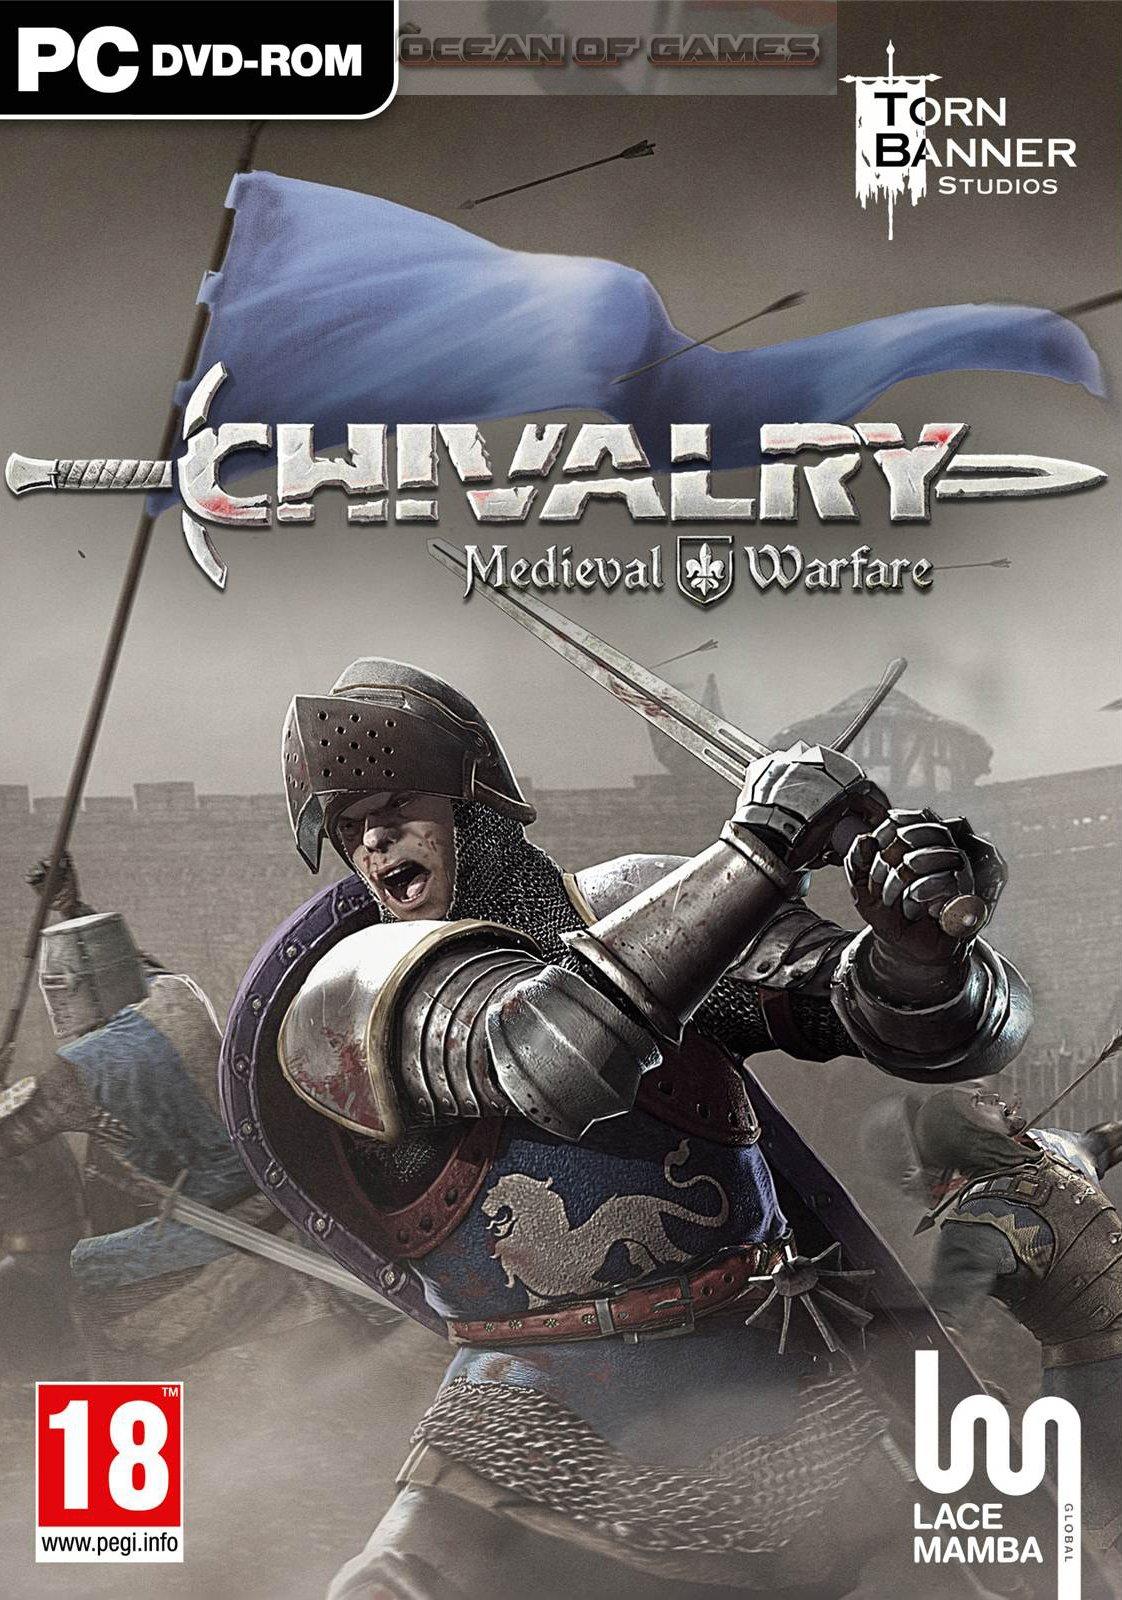 Chivalry Medieval Warfare Free Download Ocean Of Games